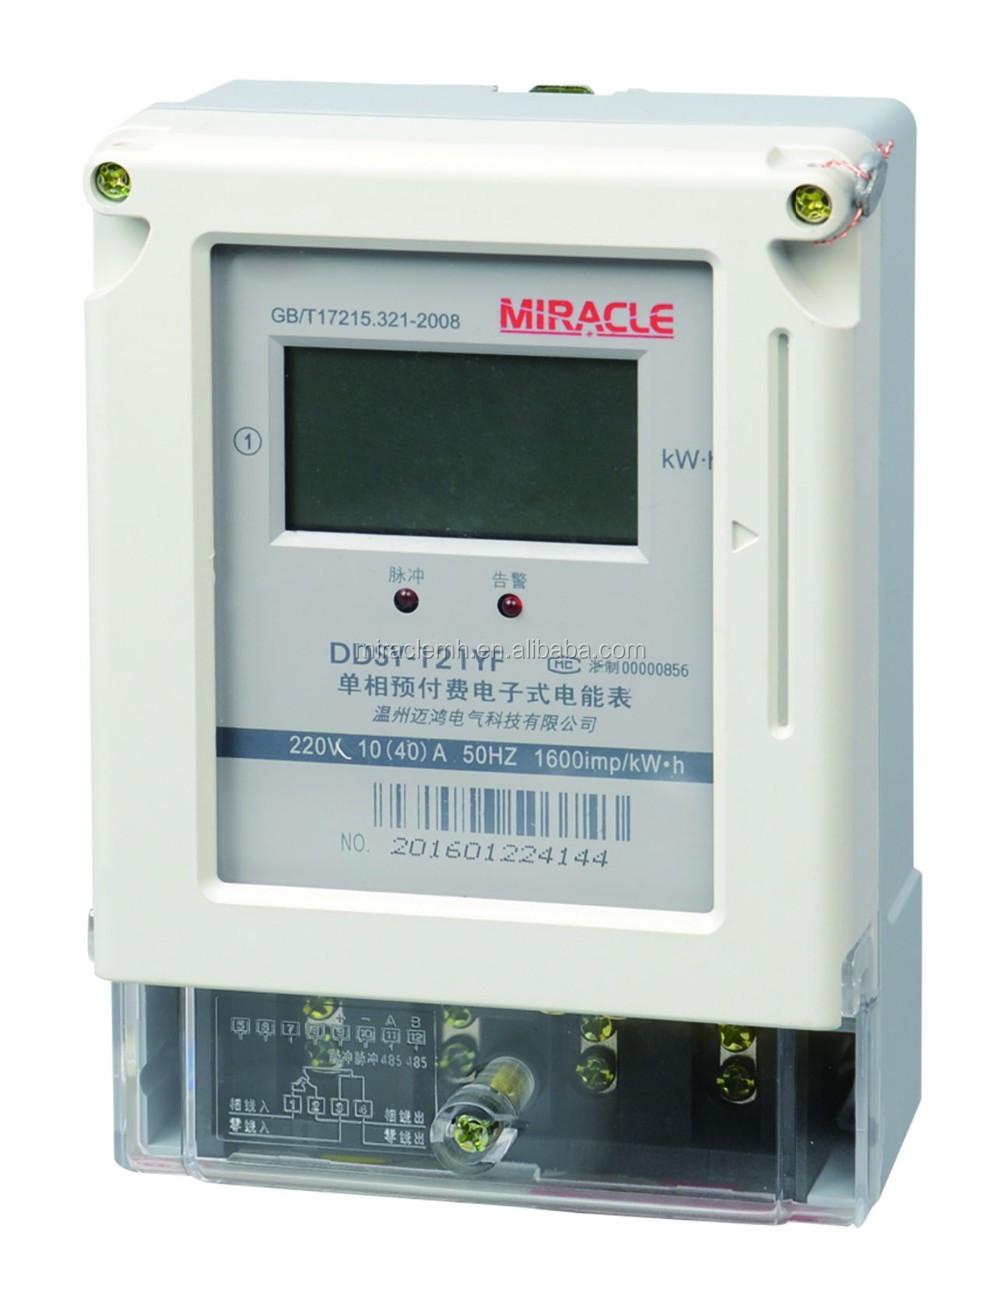 3 Phase Ic Card Bidirectional Kwh Meter